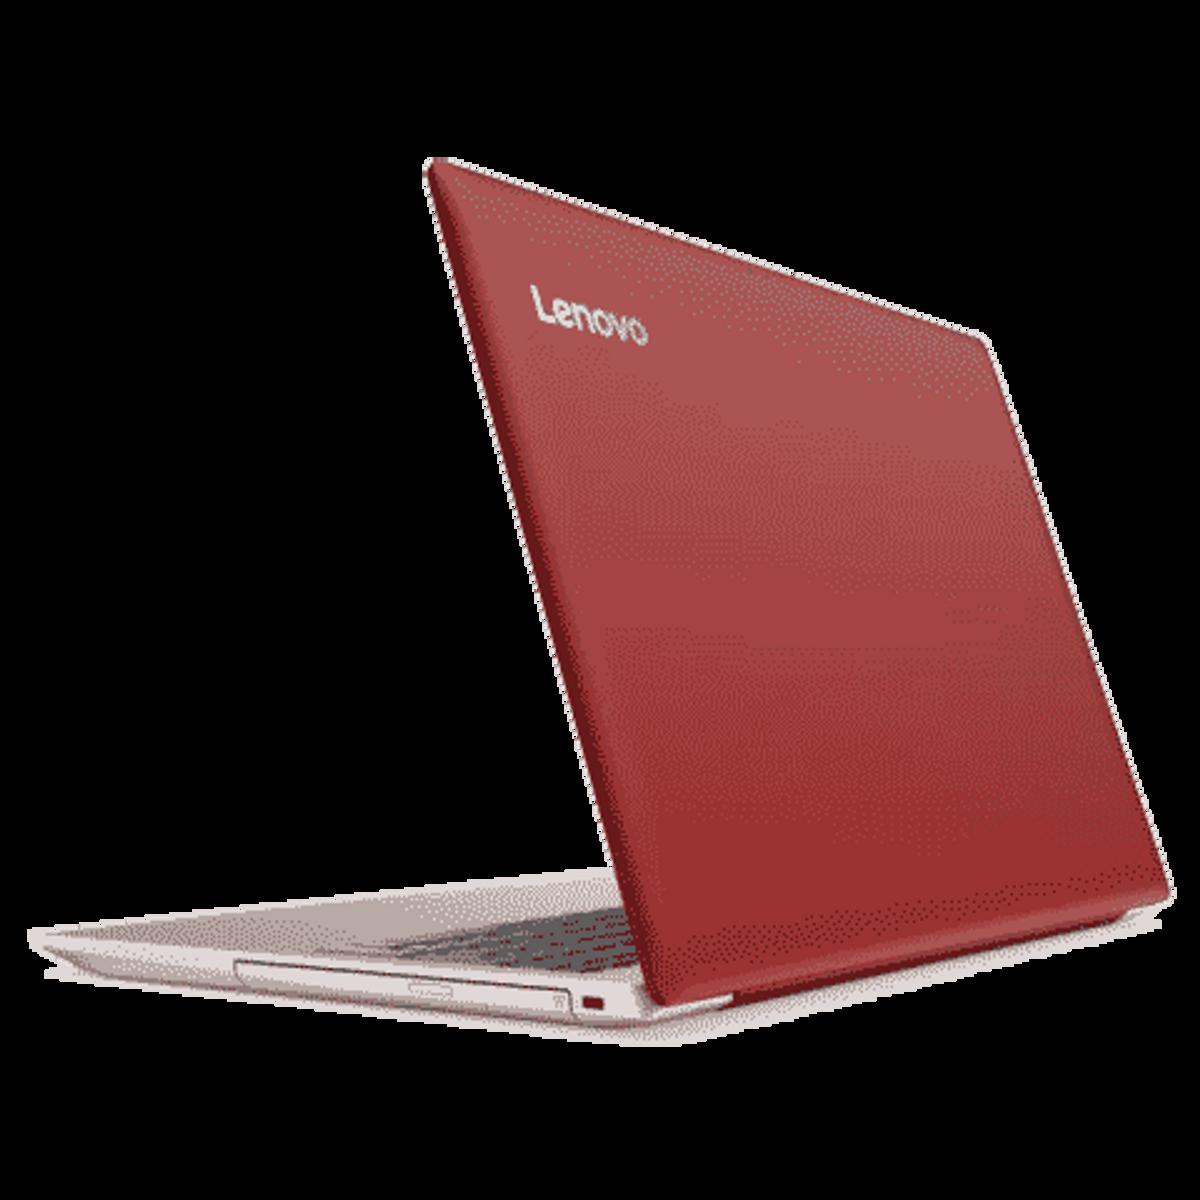 లెనోవా Ideapad 320 ఇంటెల్ Core i5